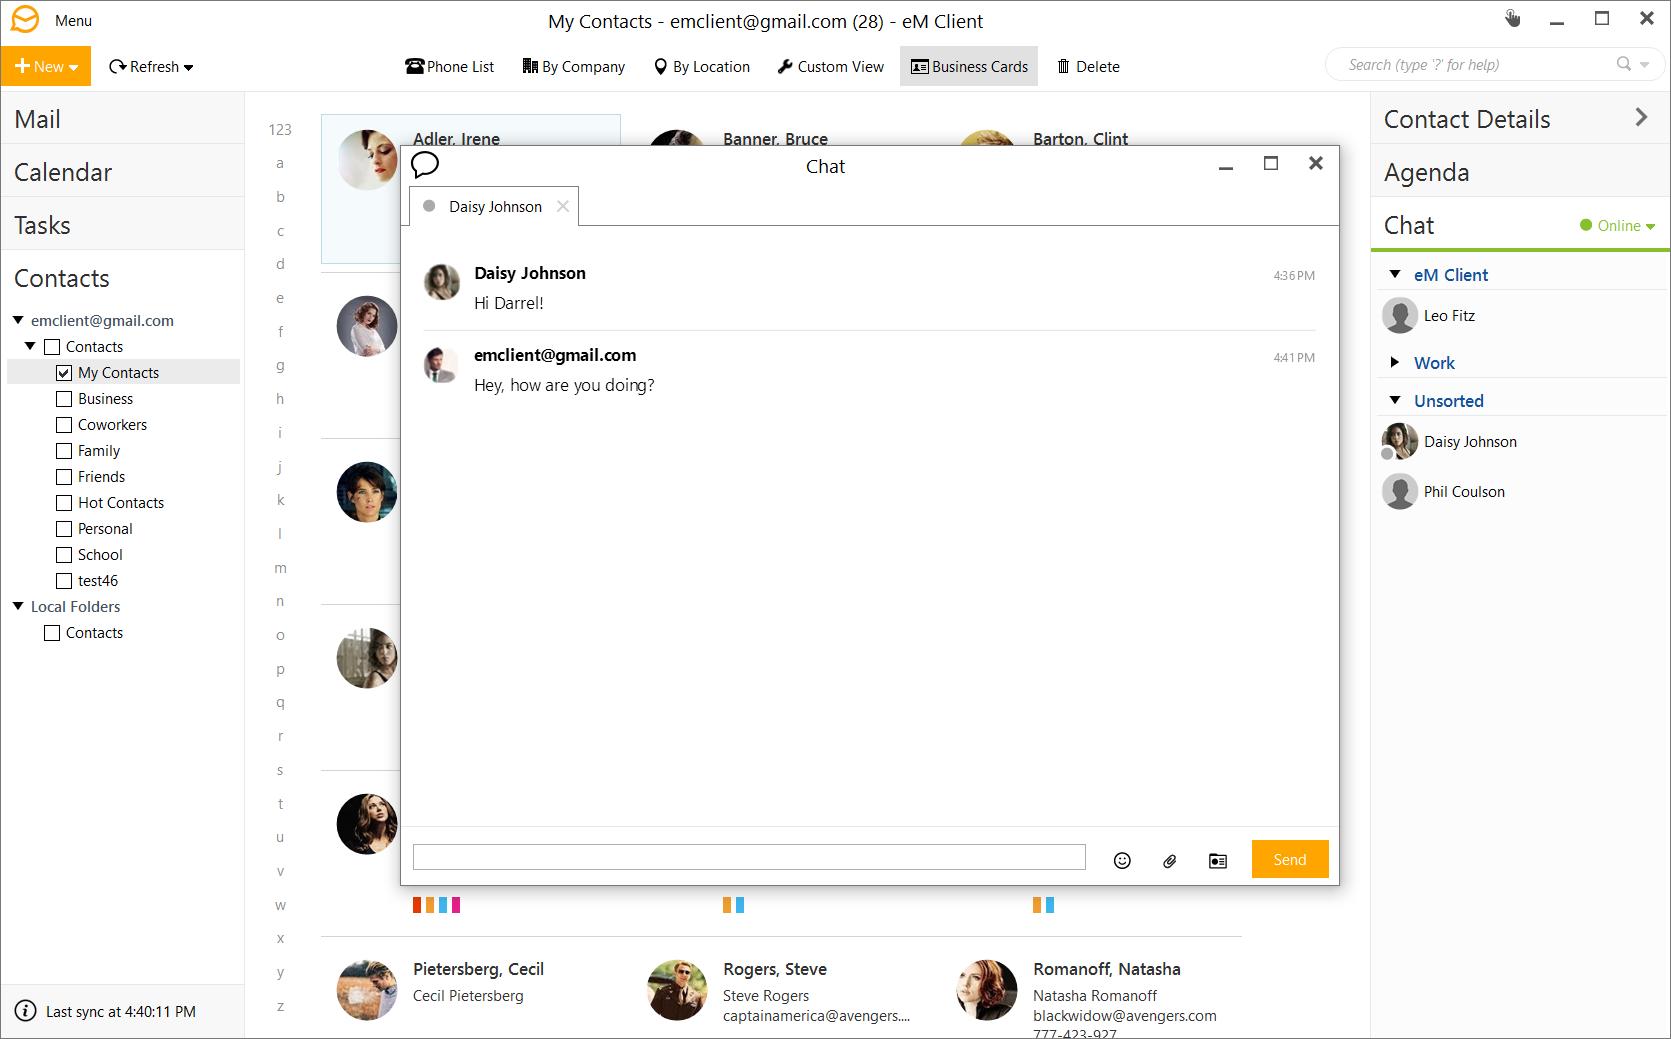 Email Tools Software, eM Client 7 Screenshot